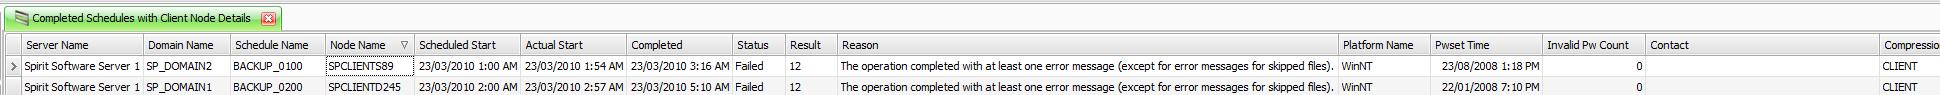 CompletedSchedulesWithClientNodeDetails